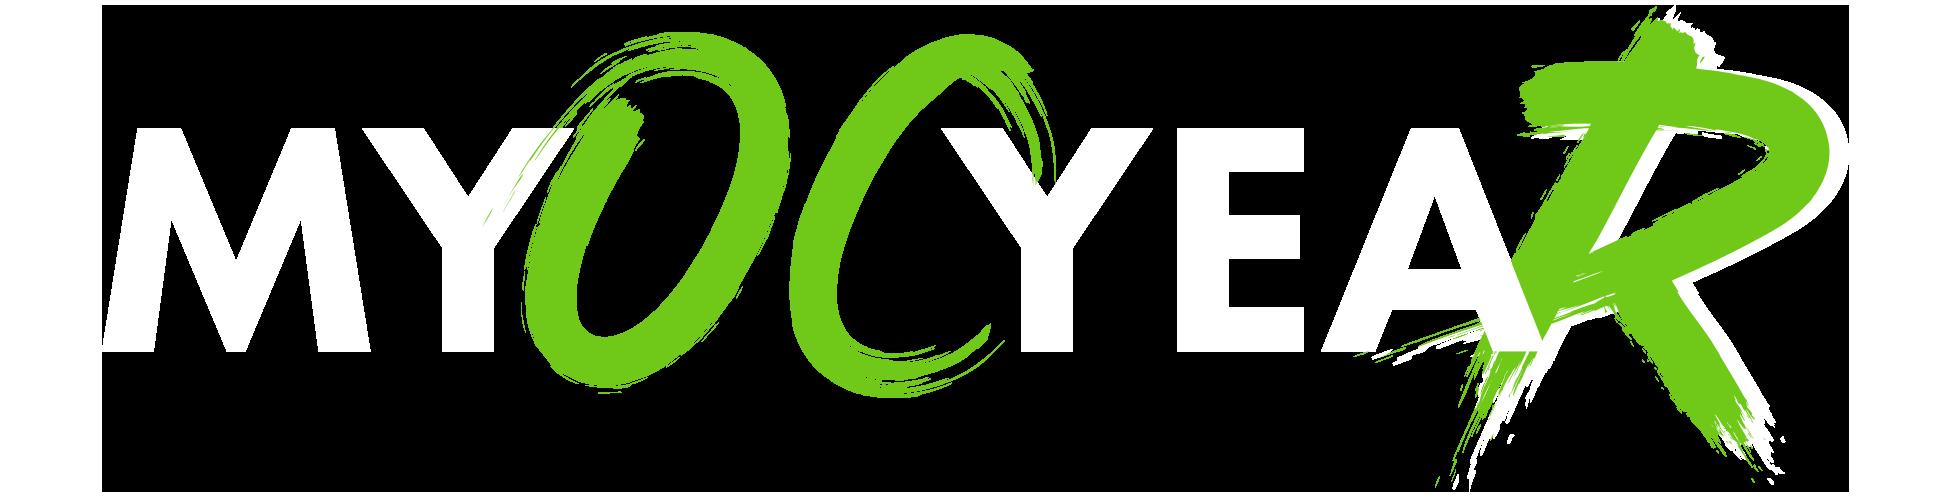 myocyear Hindernislauf Termine